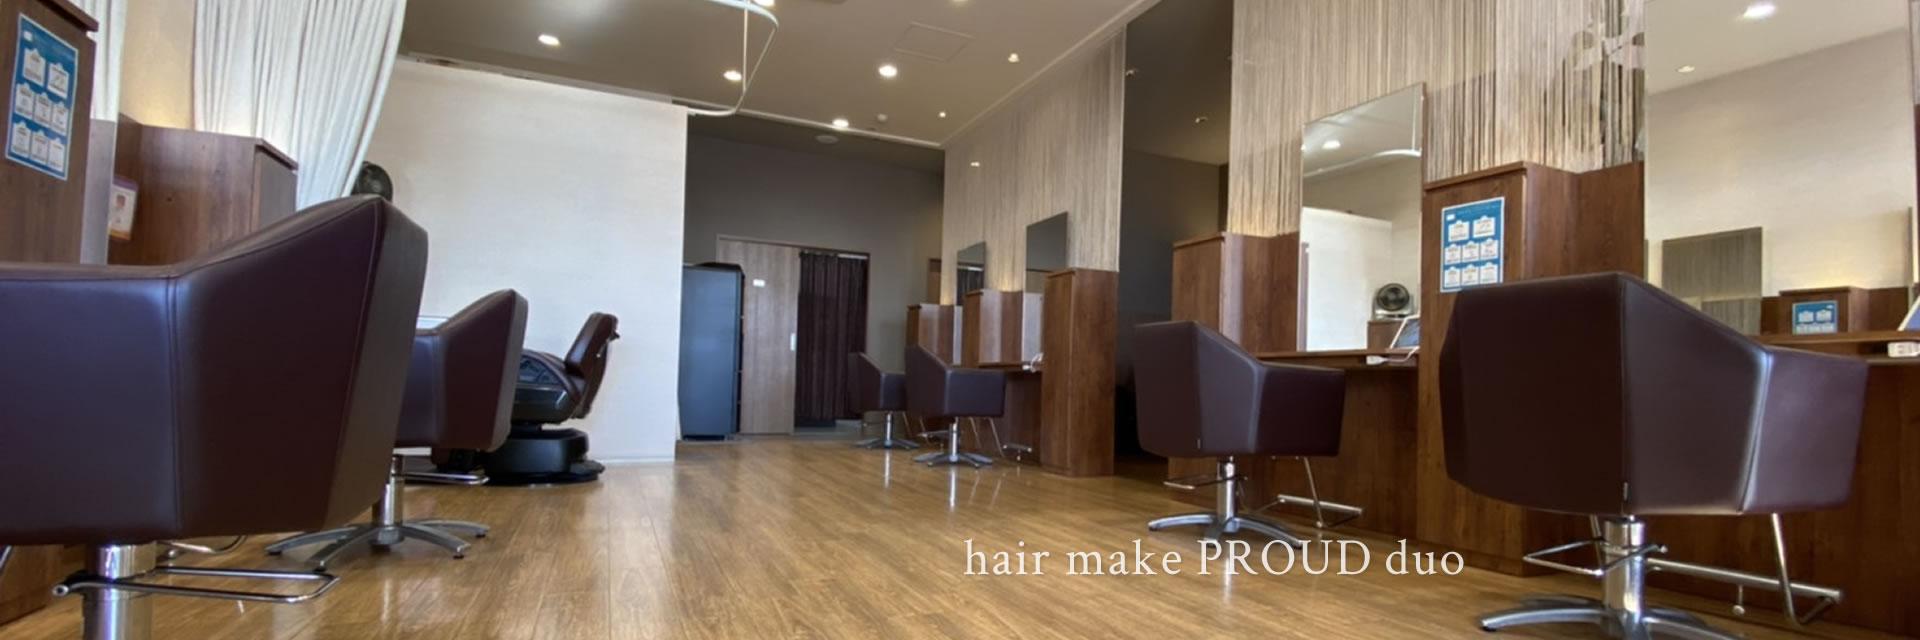 hair make PROUD duo